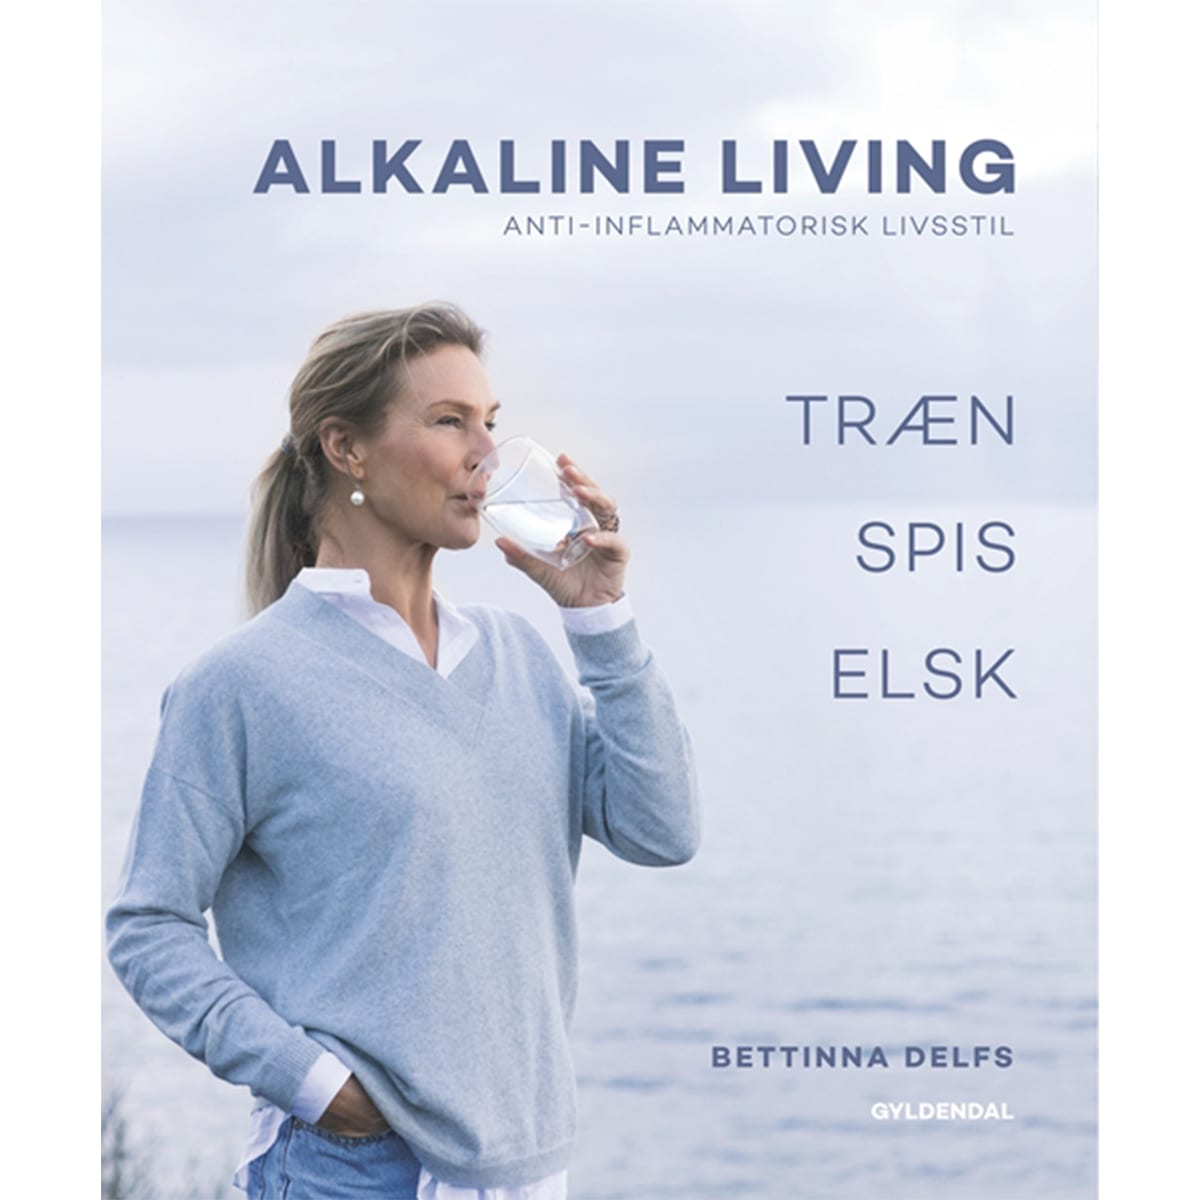 Af Bettinna Laxholm Delfs & Maiken Buchwald